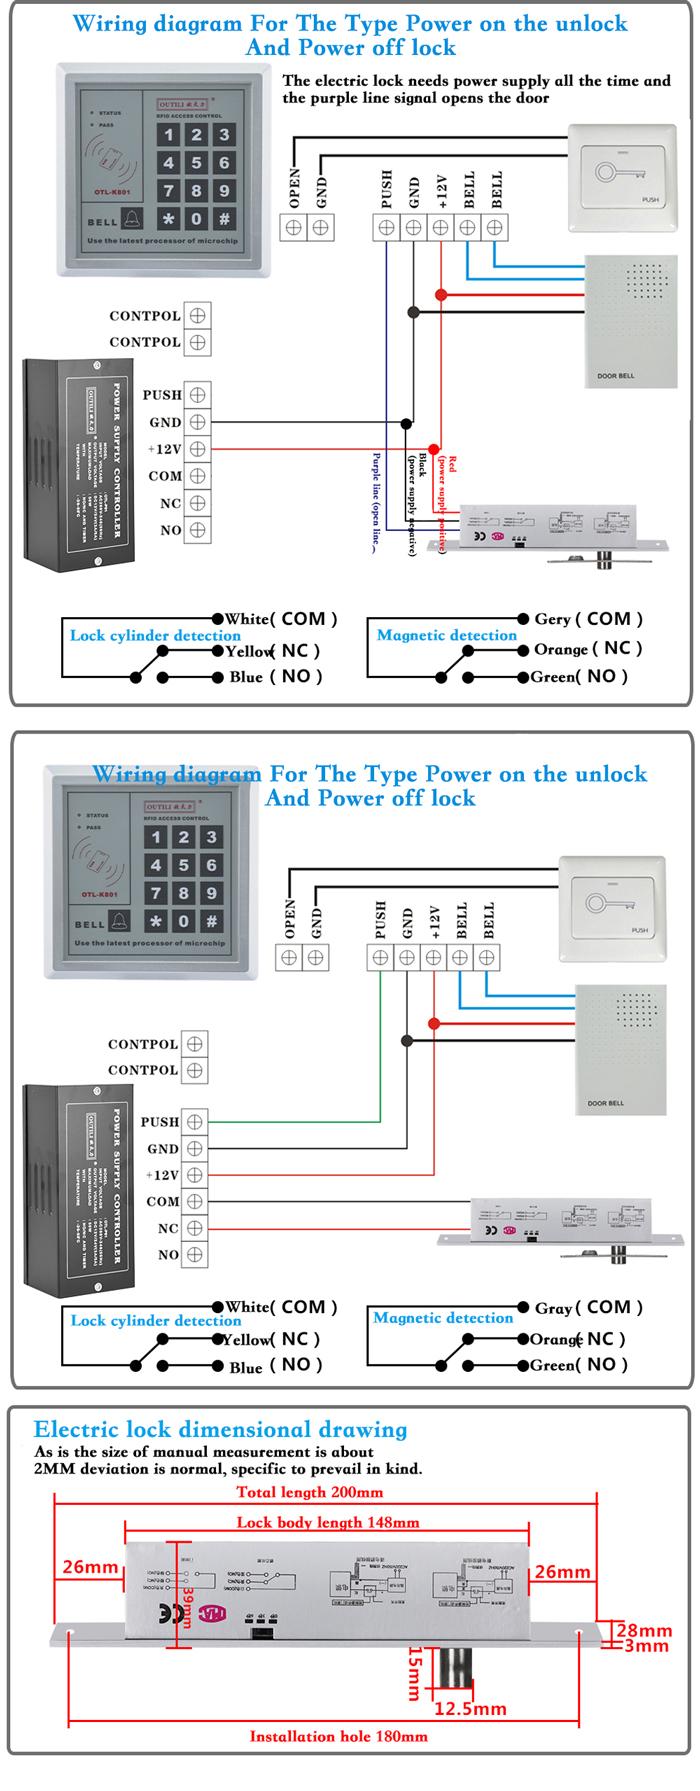 Dc12vdc24v door electric lock for access control system lock dc12vdc24v door electric lock for access control system lock delay time is adjustable wiring diagram pooptronica